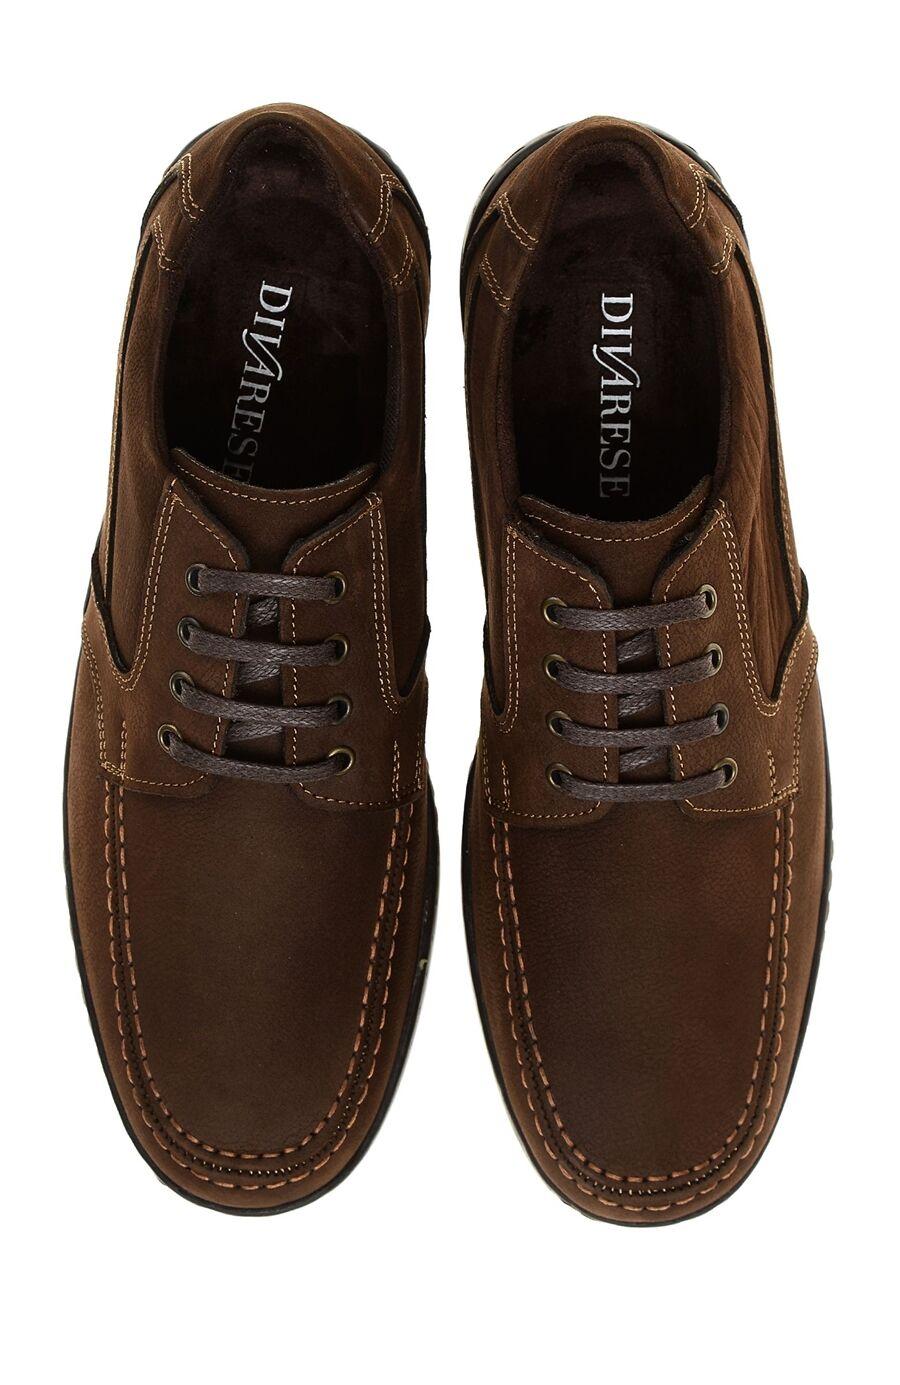 Nubuk Kahverengi Ayakkabı